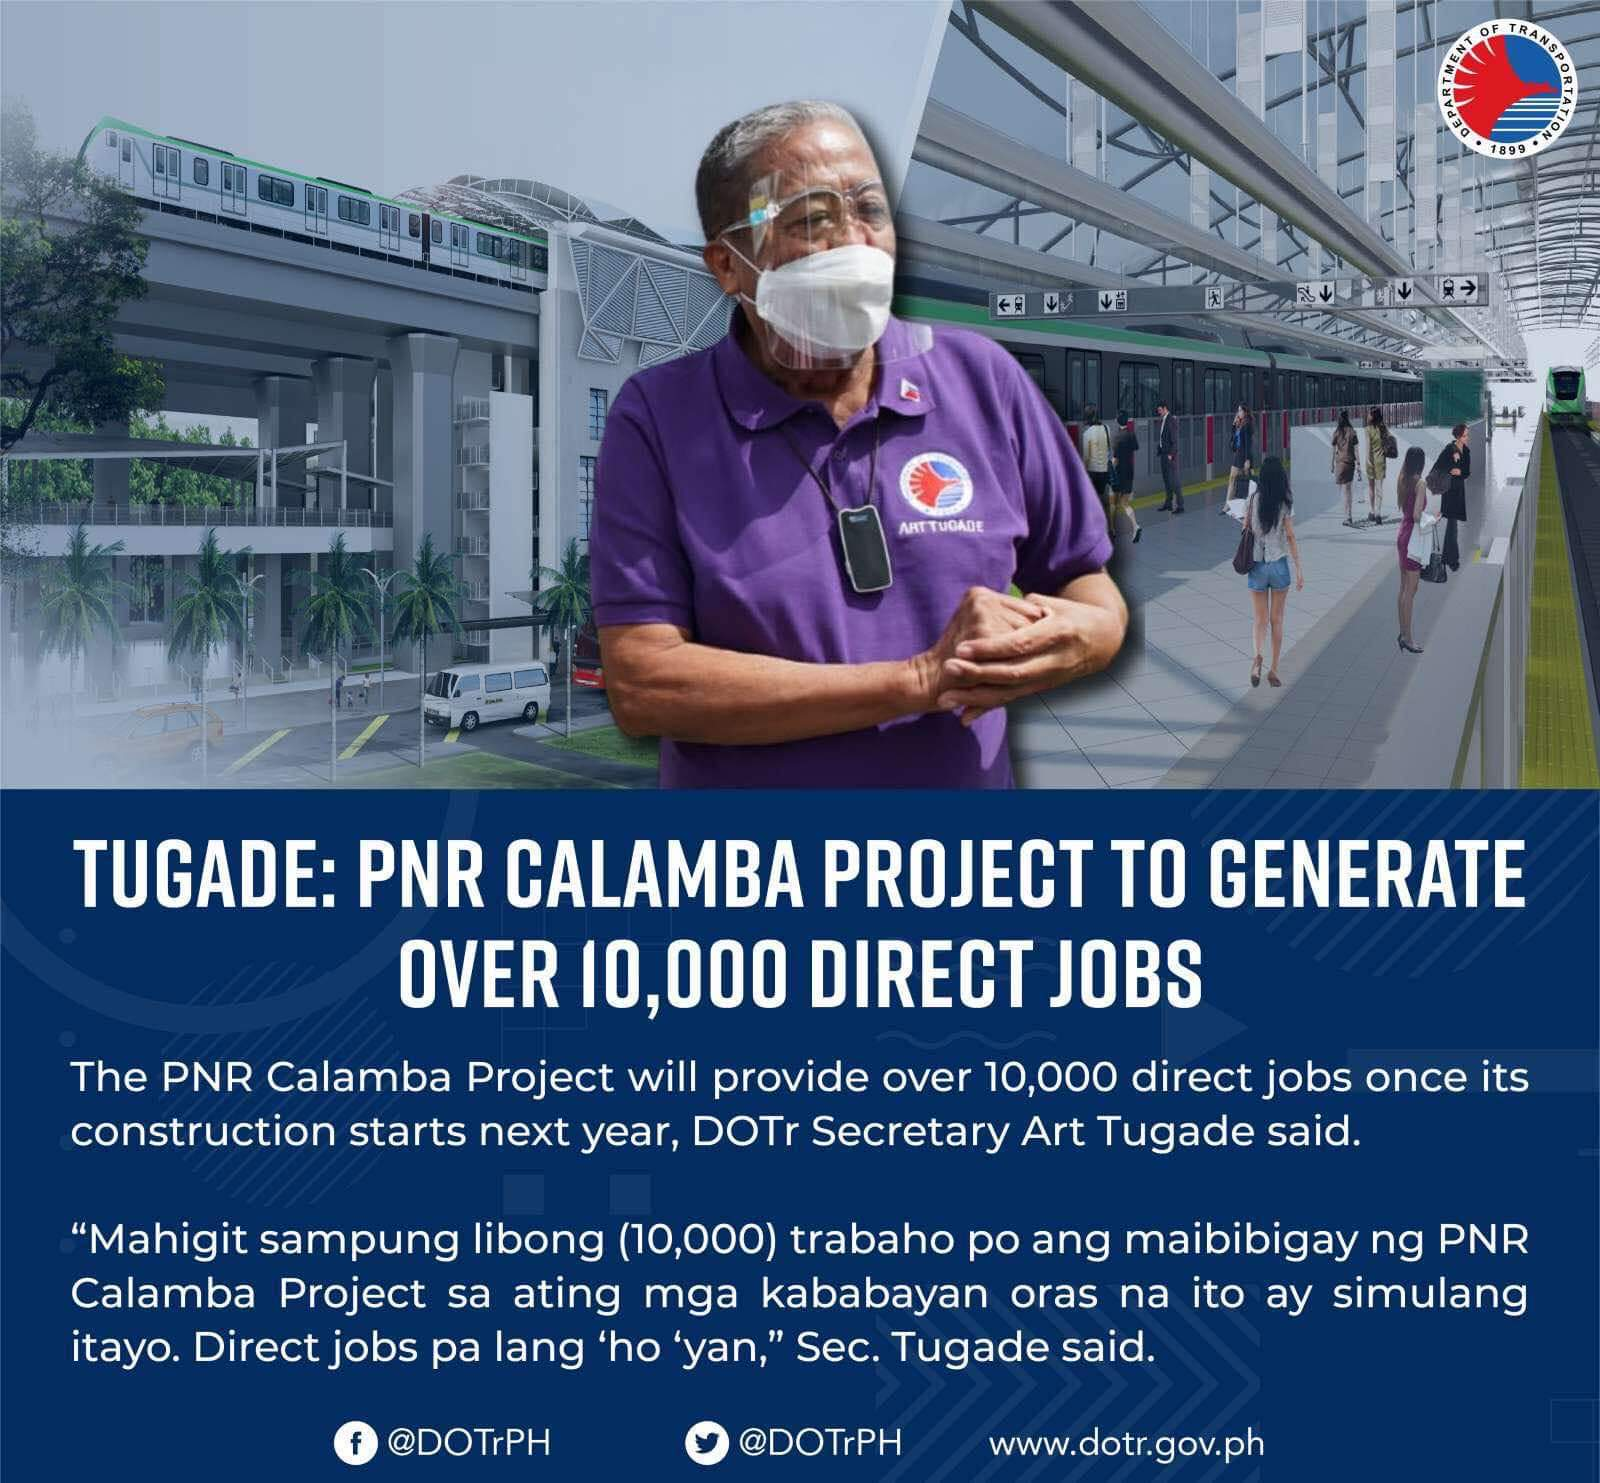 Build Build Build project PNR Calamba, to generate 10,000 direct jobs